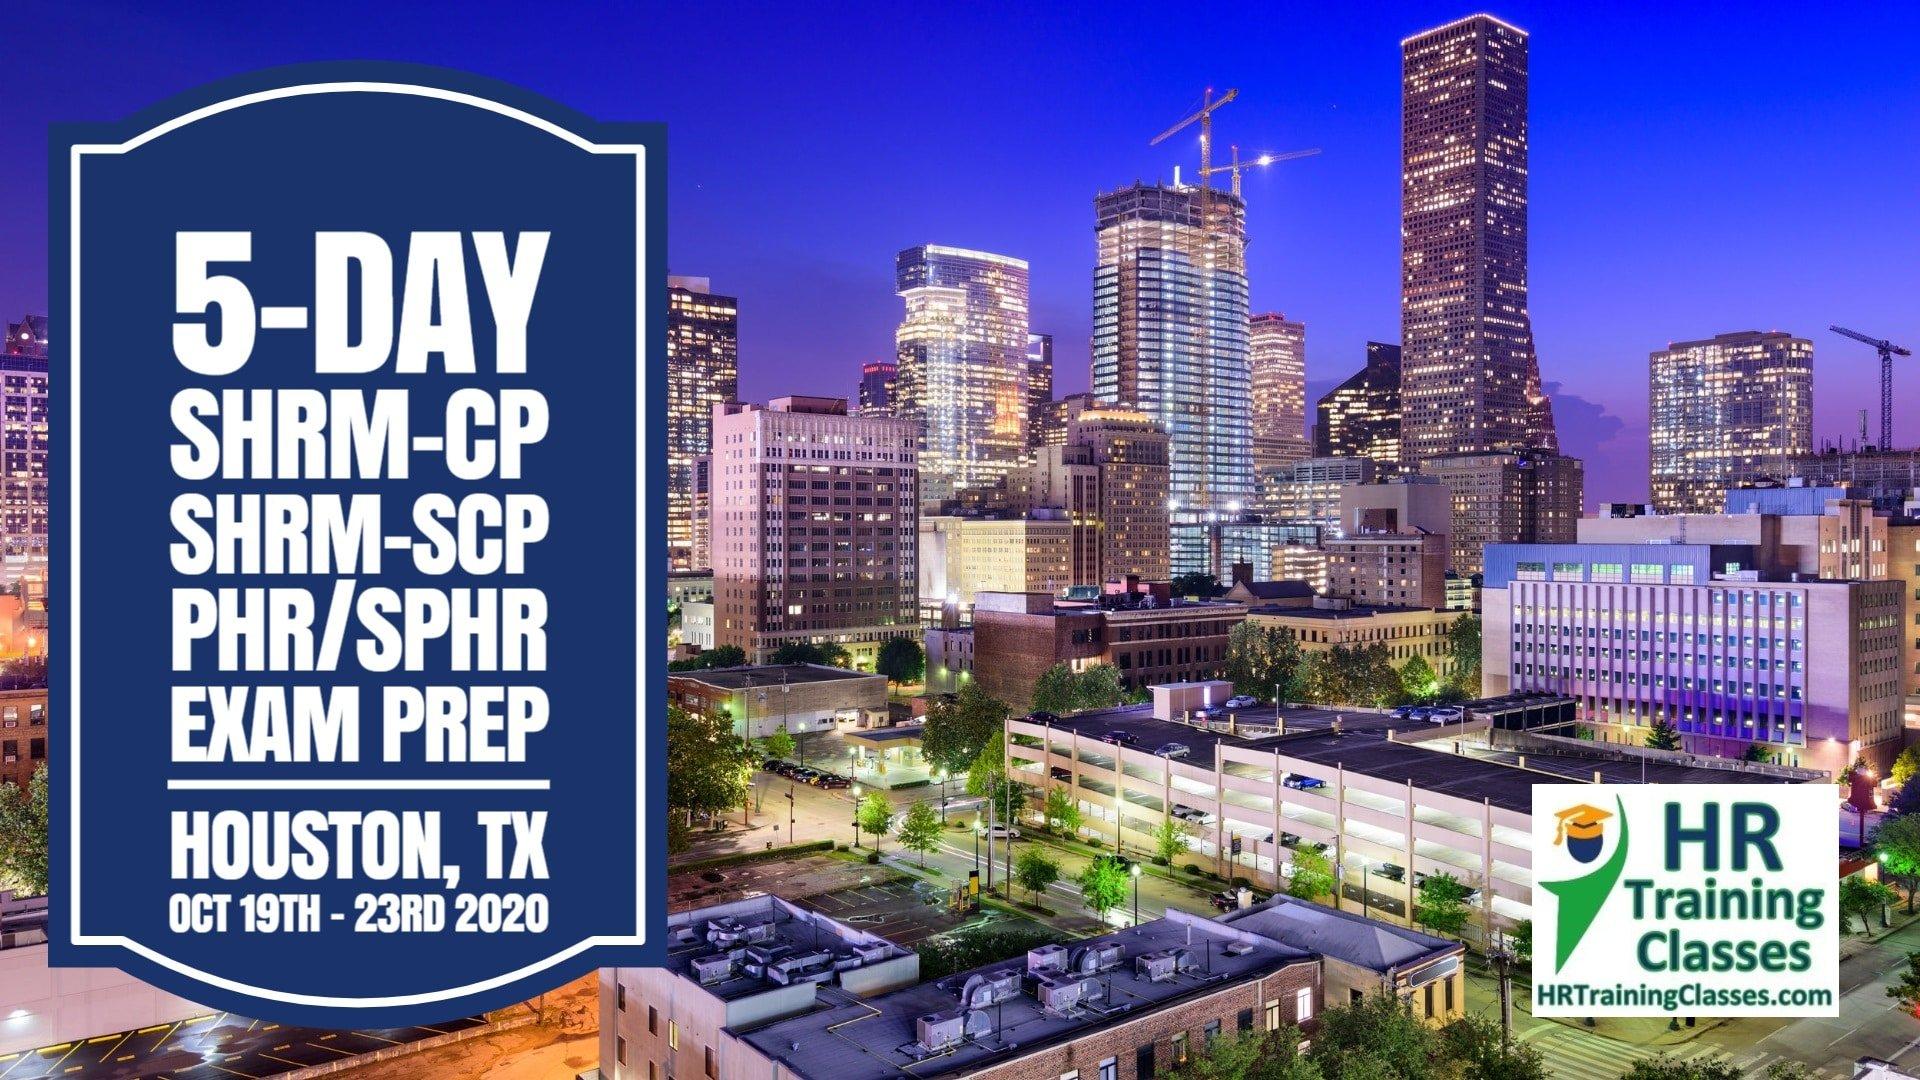 5 Day SHRM-CP, SHRM-SCP, PHR, SPHR Exam Prep Workshop in Houston, TX starting 10-19-20 and led by Elga lejarza-Penn